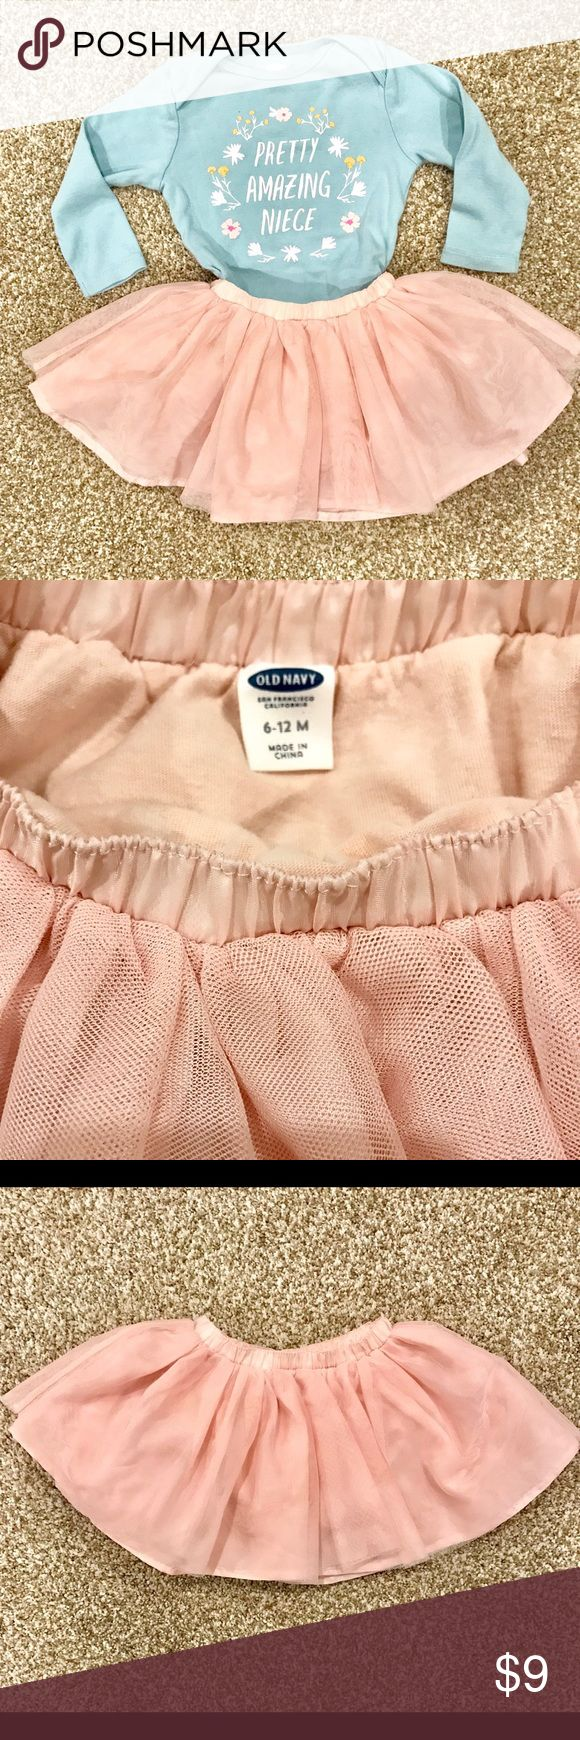 Old Navy Girls 6 12 Months Tutu Skirt Pale Pink